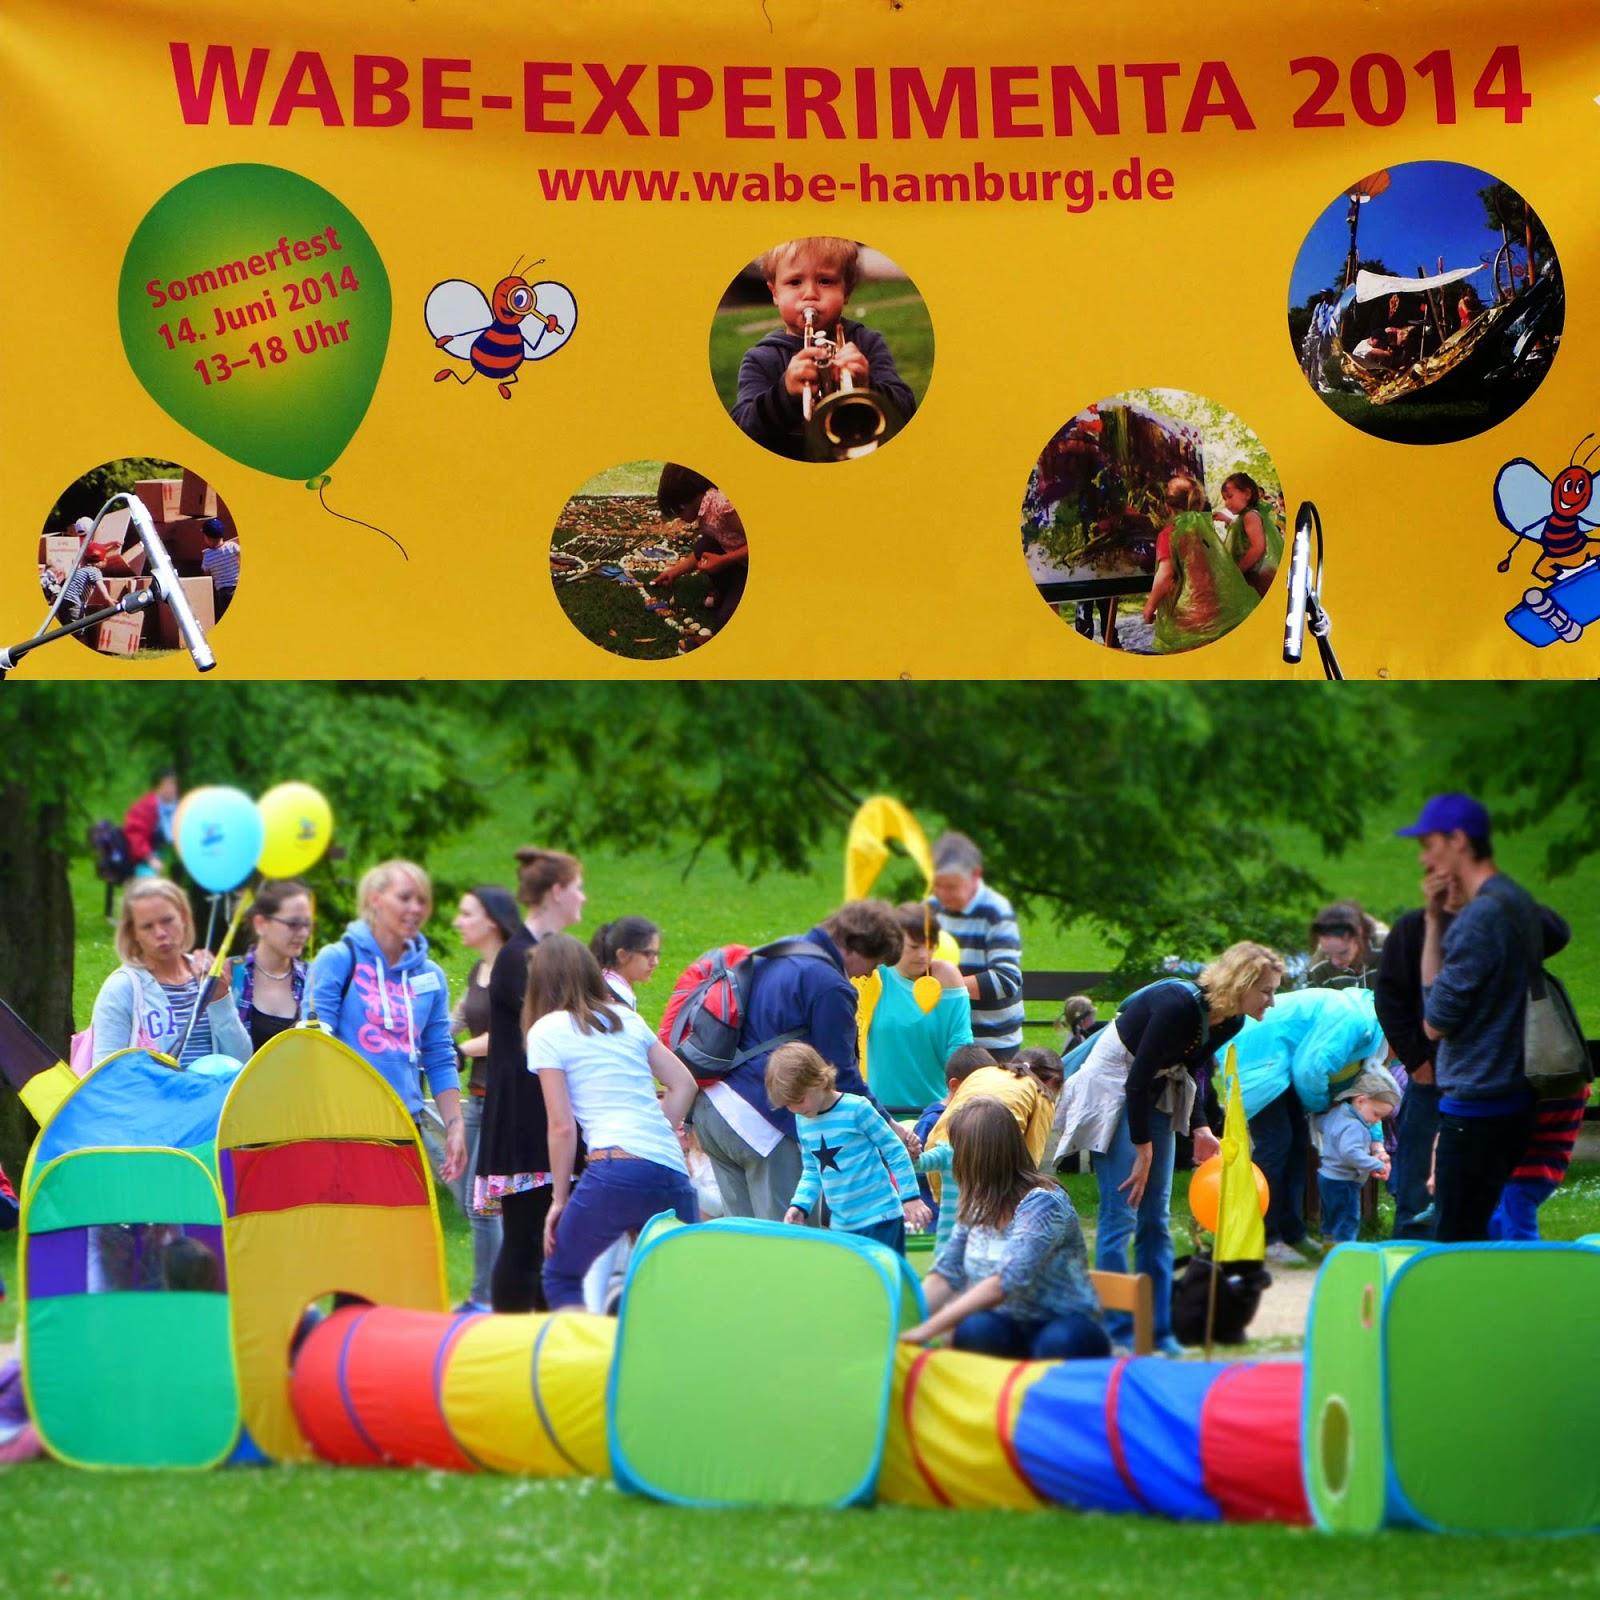 Kinderfest Hamburg, Wabe Experimenta, Wabe Kinderfest, Sommerfest für Kinder